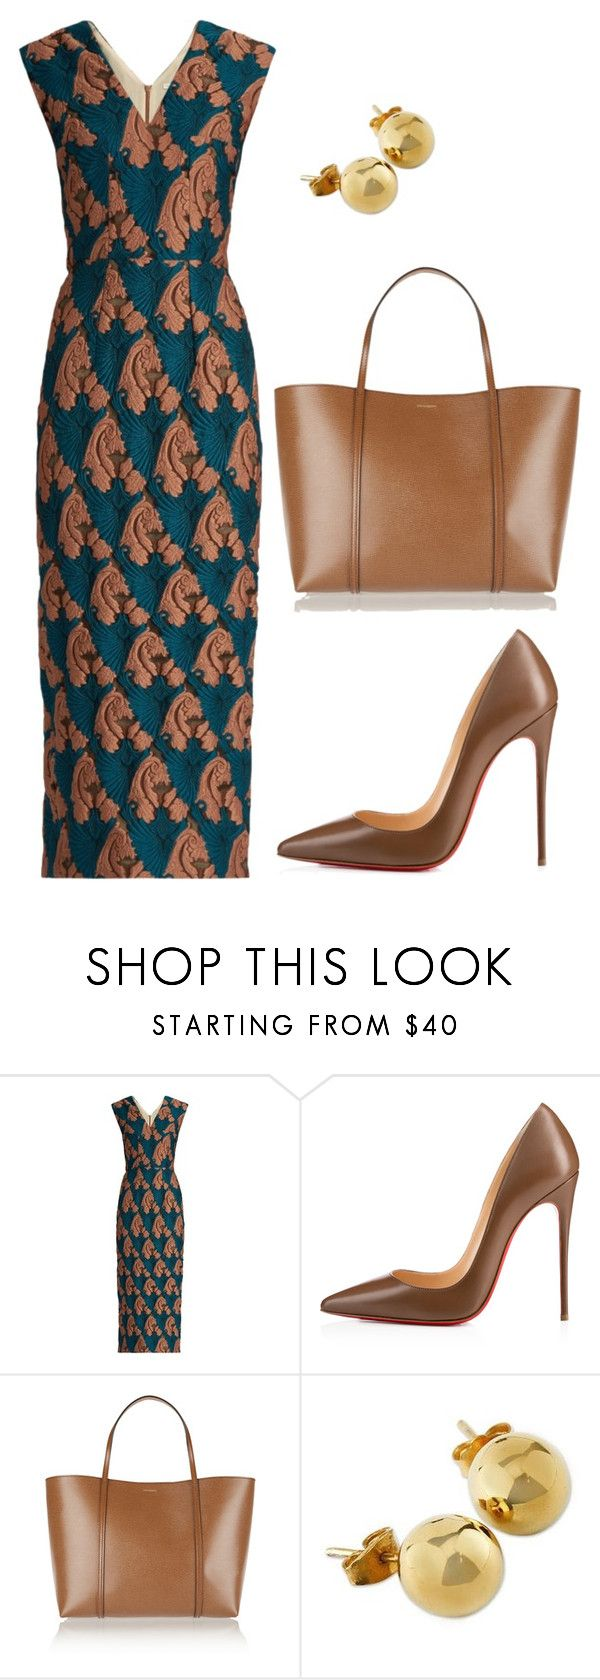 """style theory by Helia"" by heliaamado on Polyvore featuring moda, Emilia Wickstead, Christian Louboutin, Dolce&Gabbana e NOVICA"